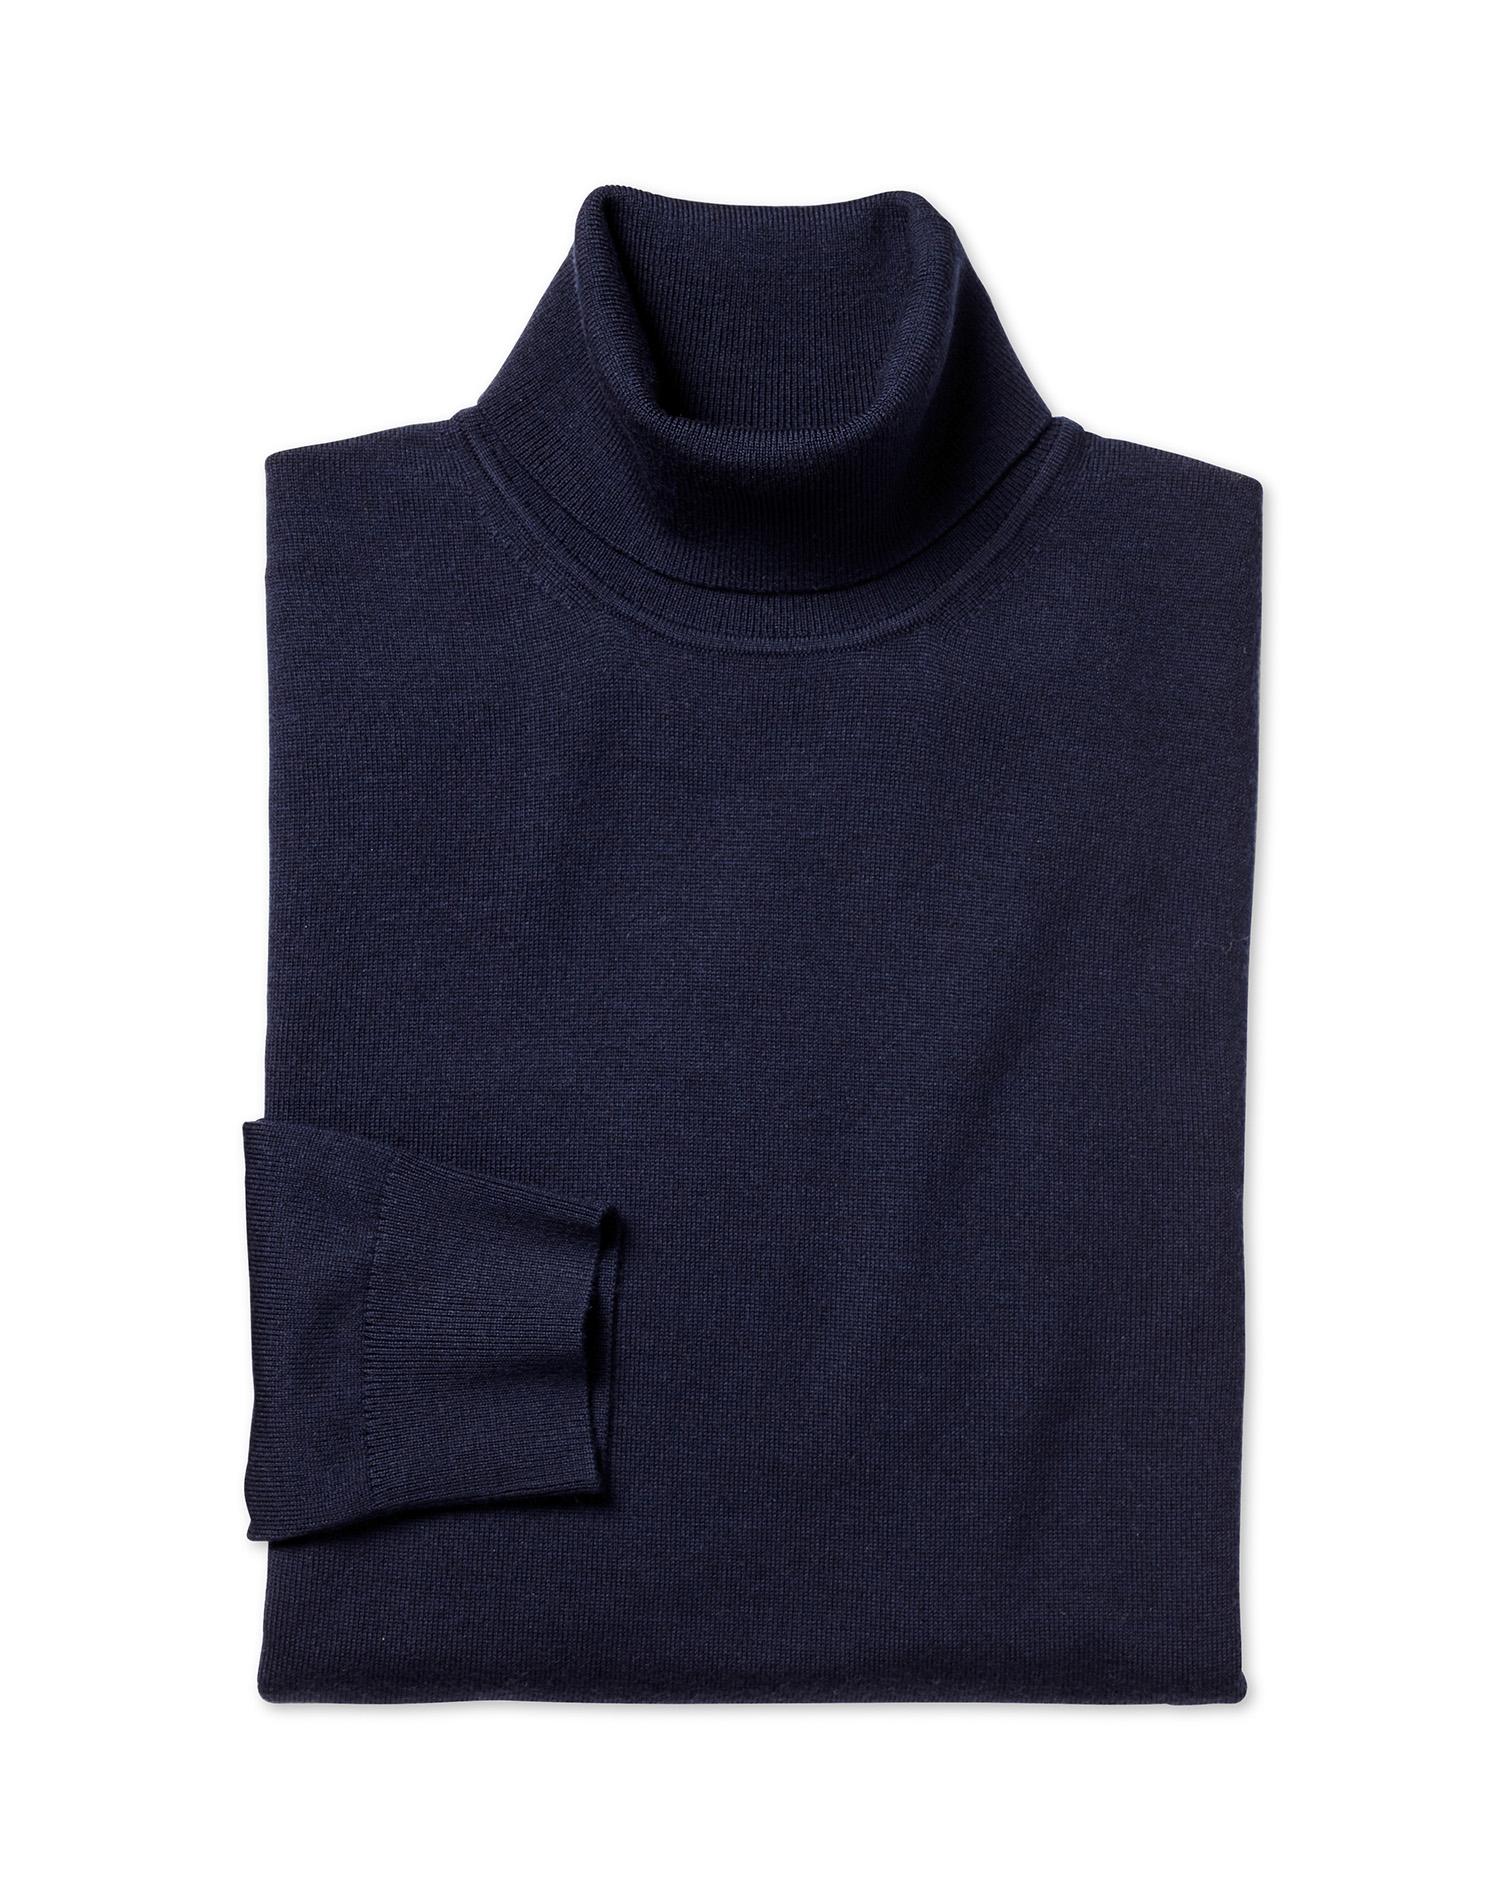 Navy Merino Wool Roll Neck Jumper Size Large by Charles Tyrwhitt